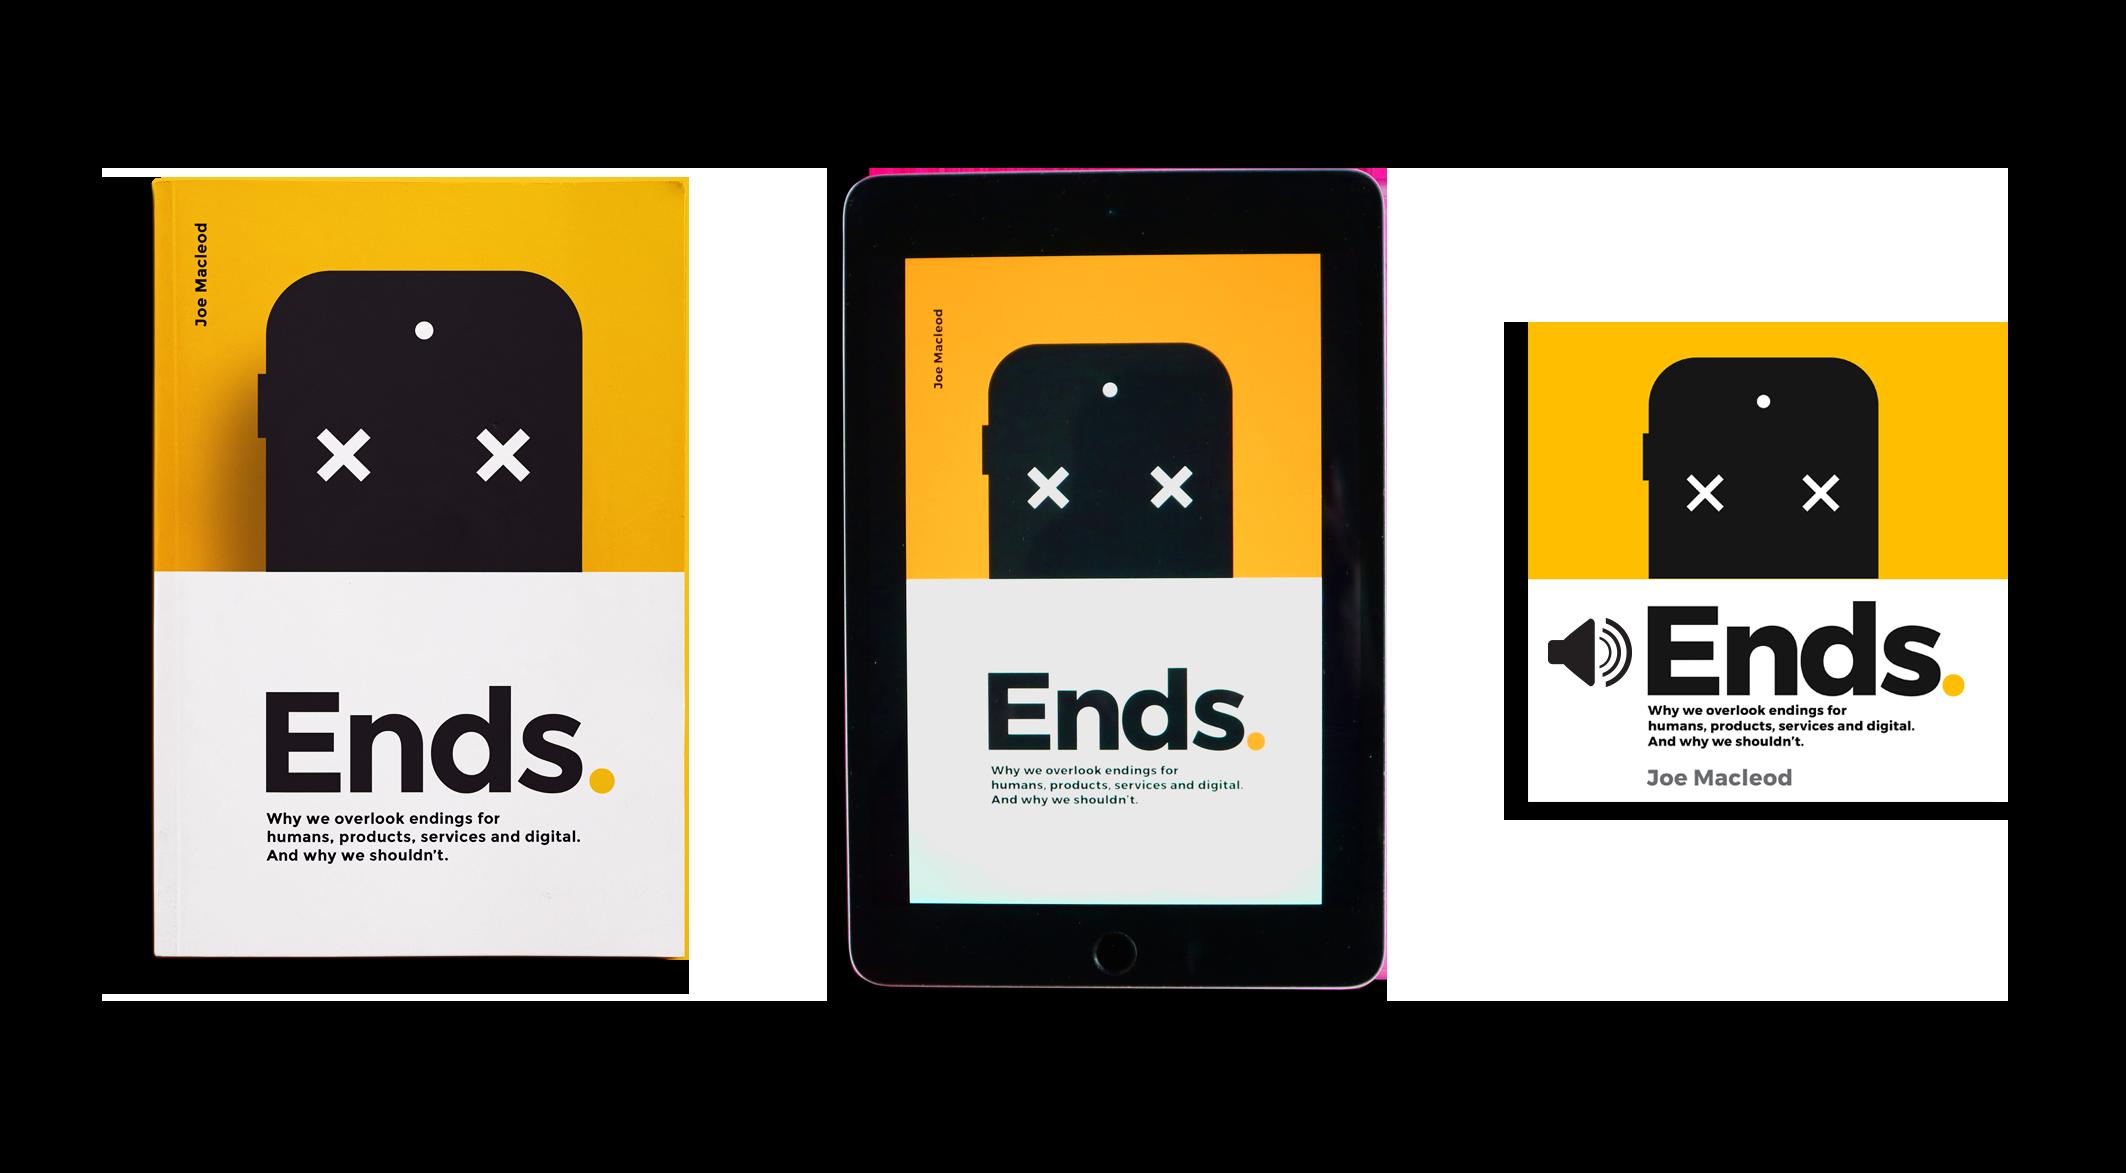 Ends_EbookAndPaperAudio_DropShadow.png